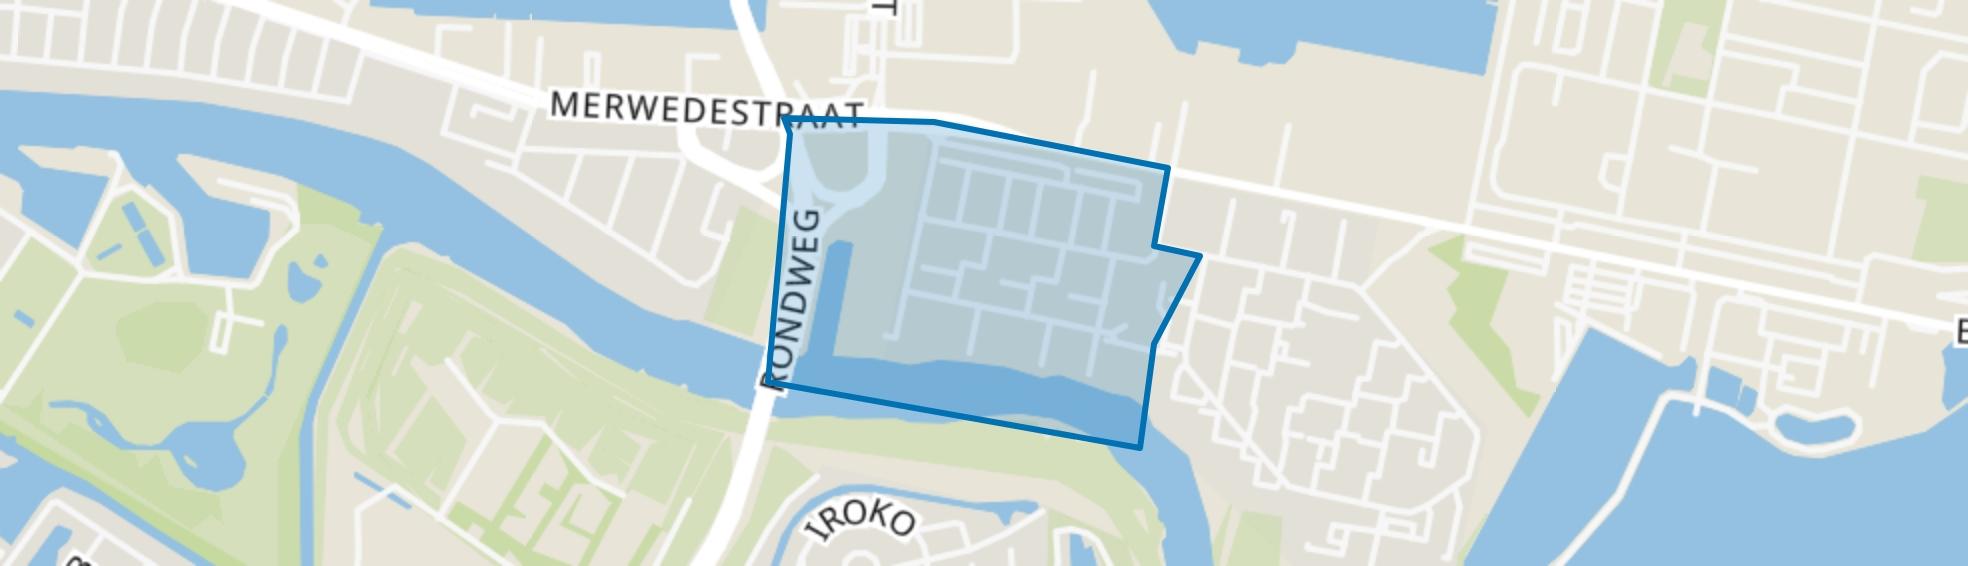 Merwedepolder-West, Dordrecht map